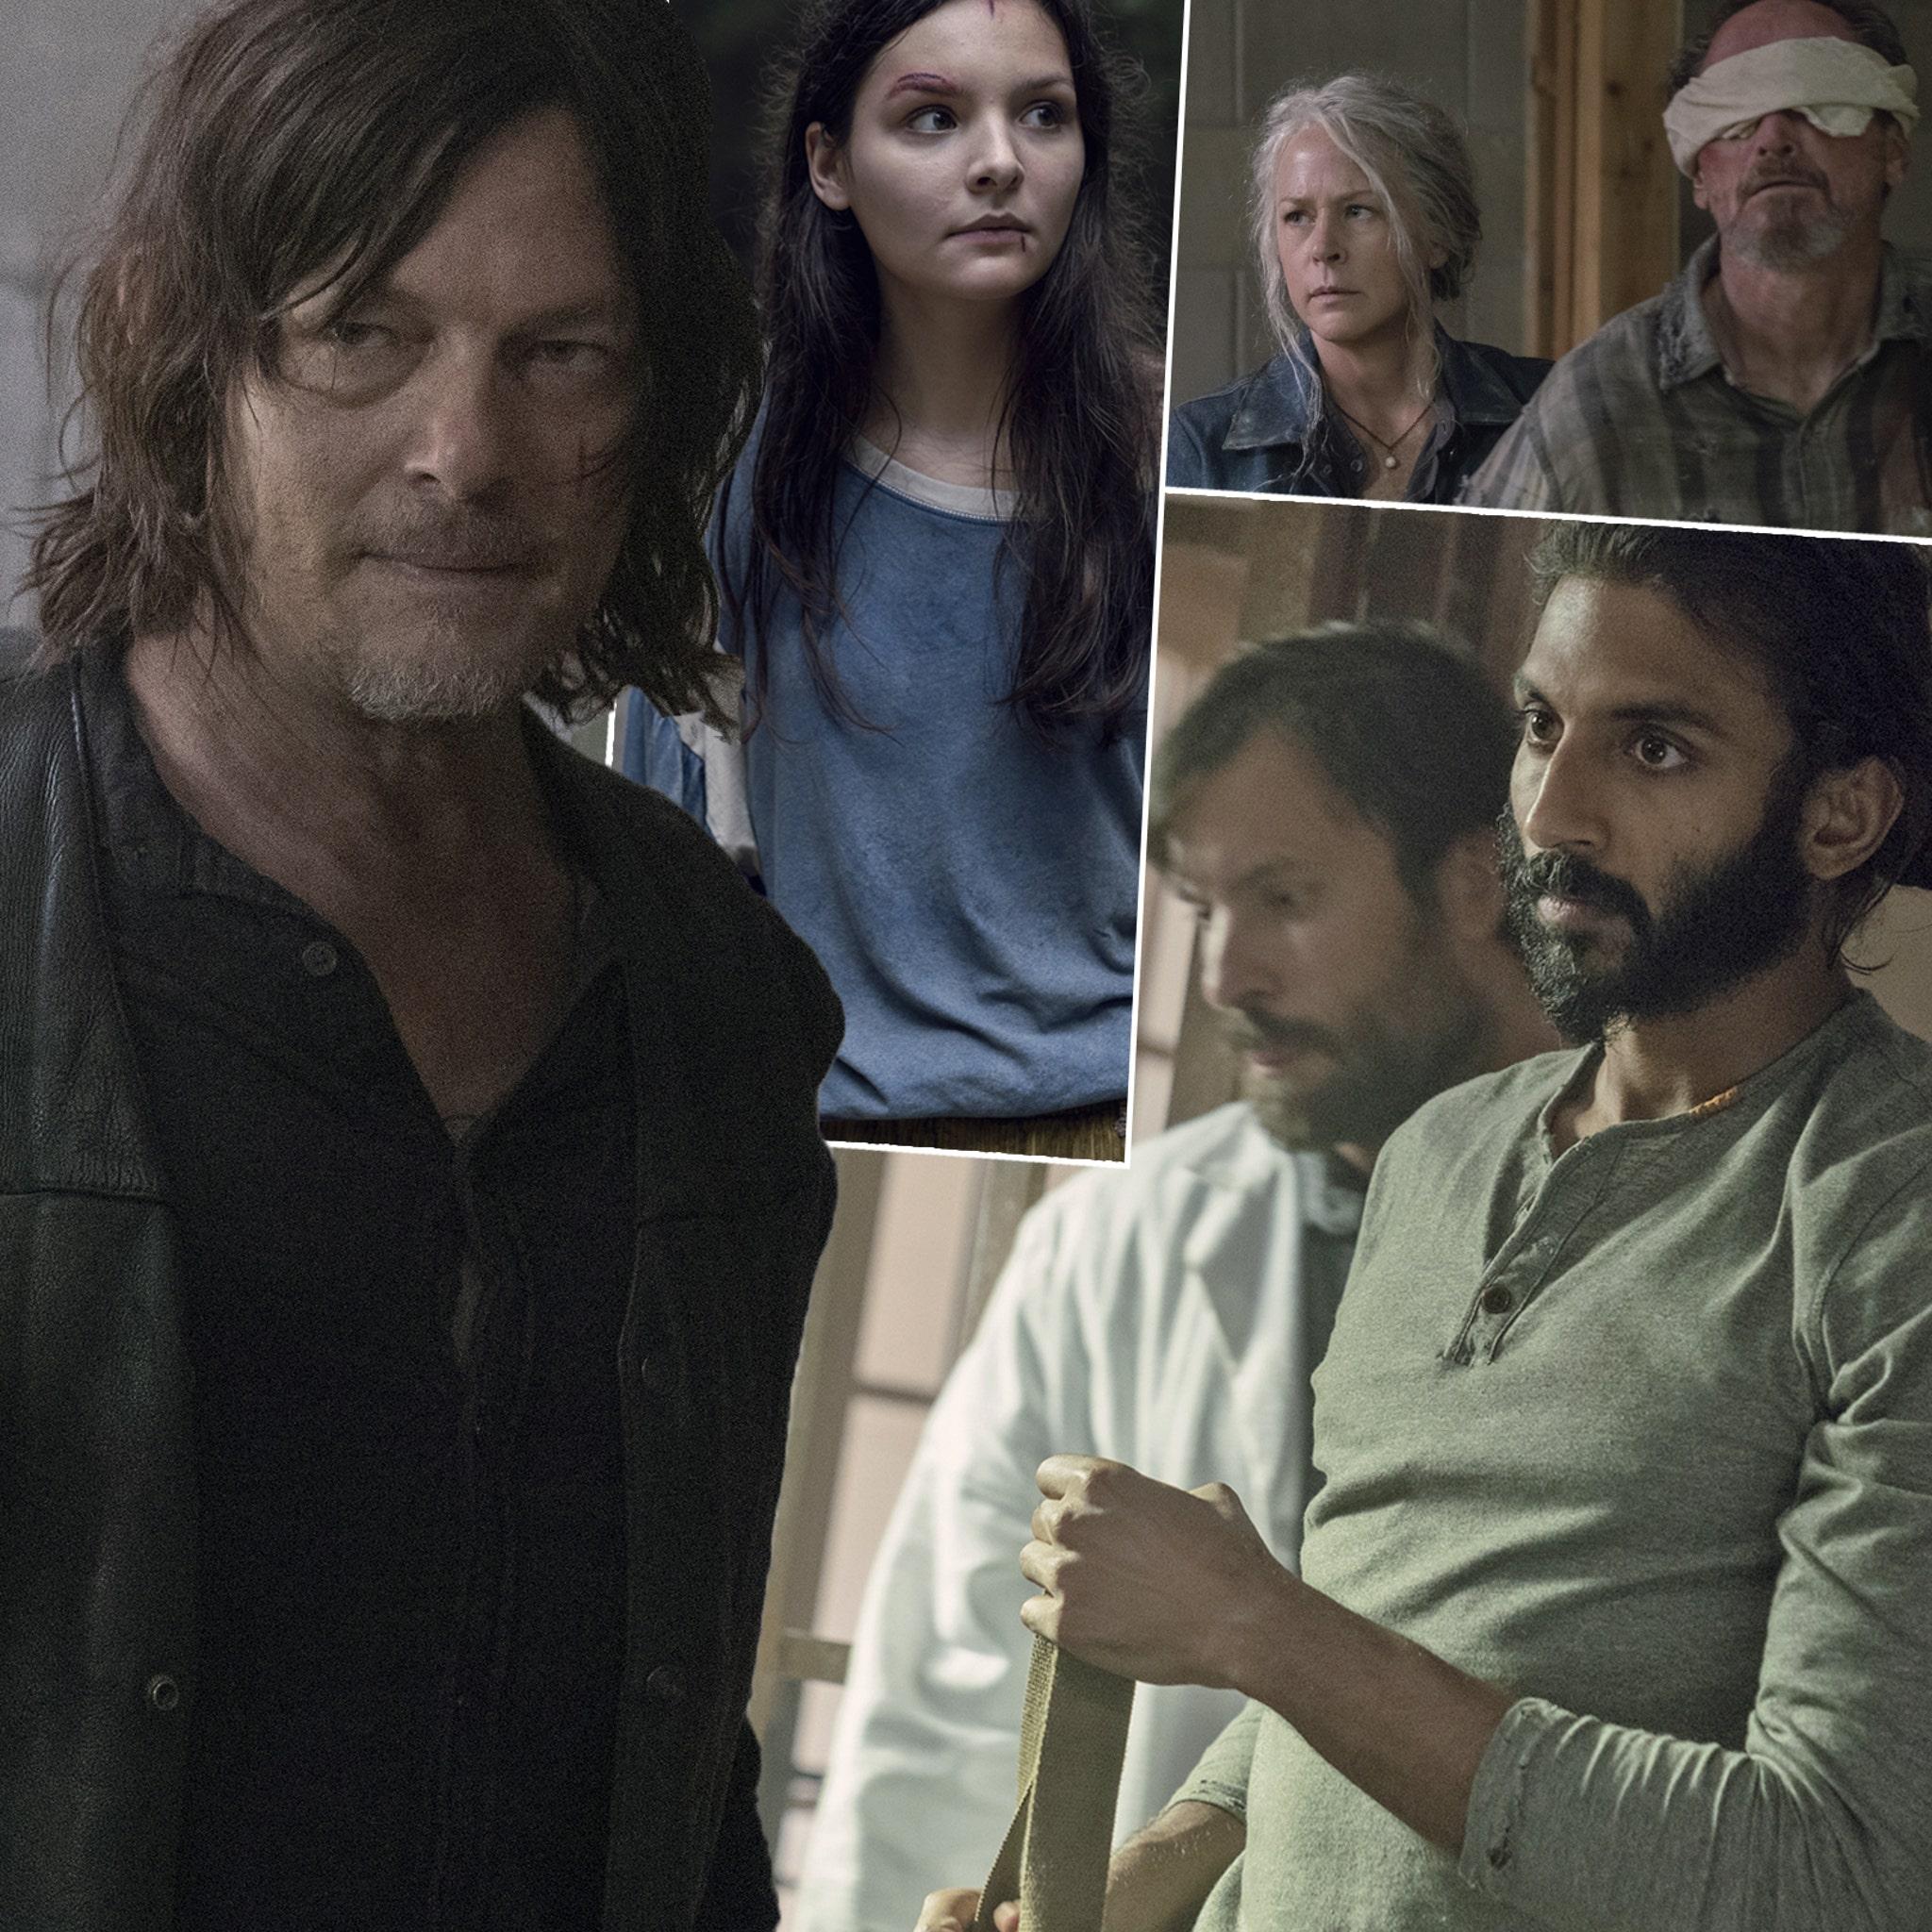 The Walking Dead Kills Off Main Cast Member After Shocking Betrayal